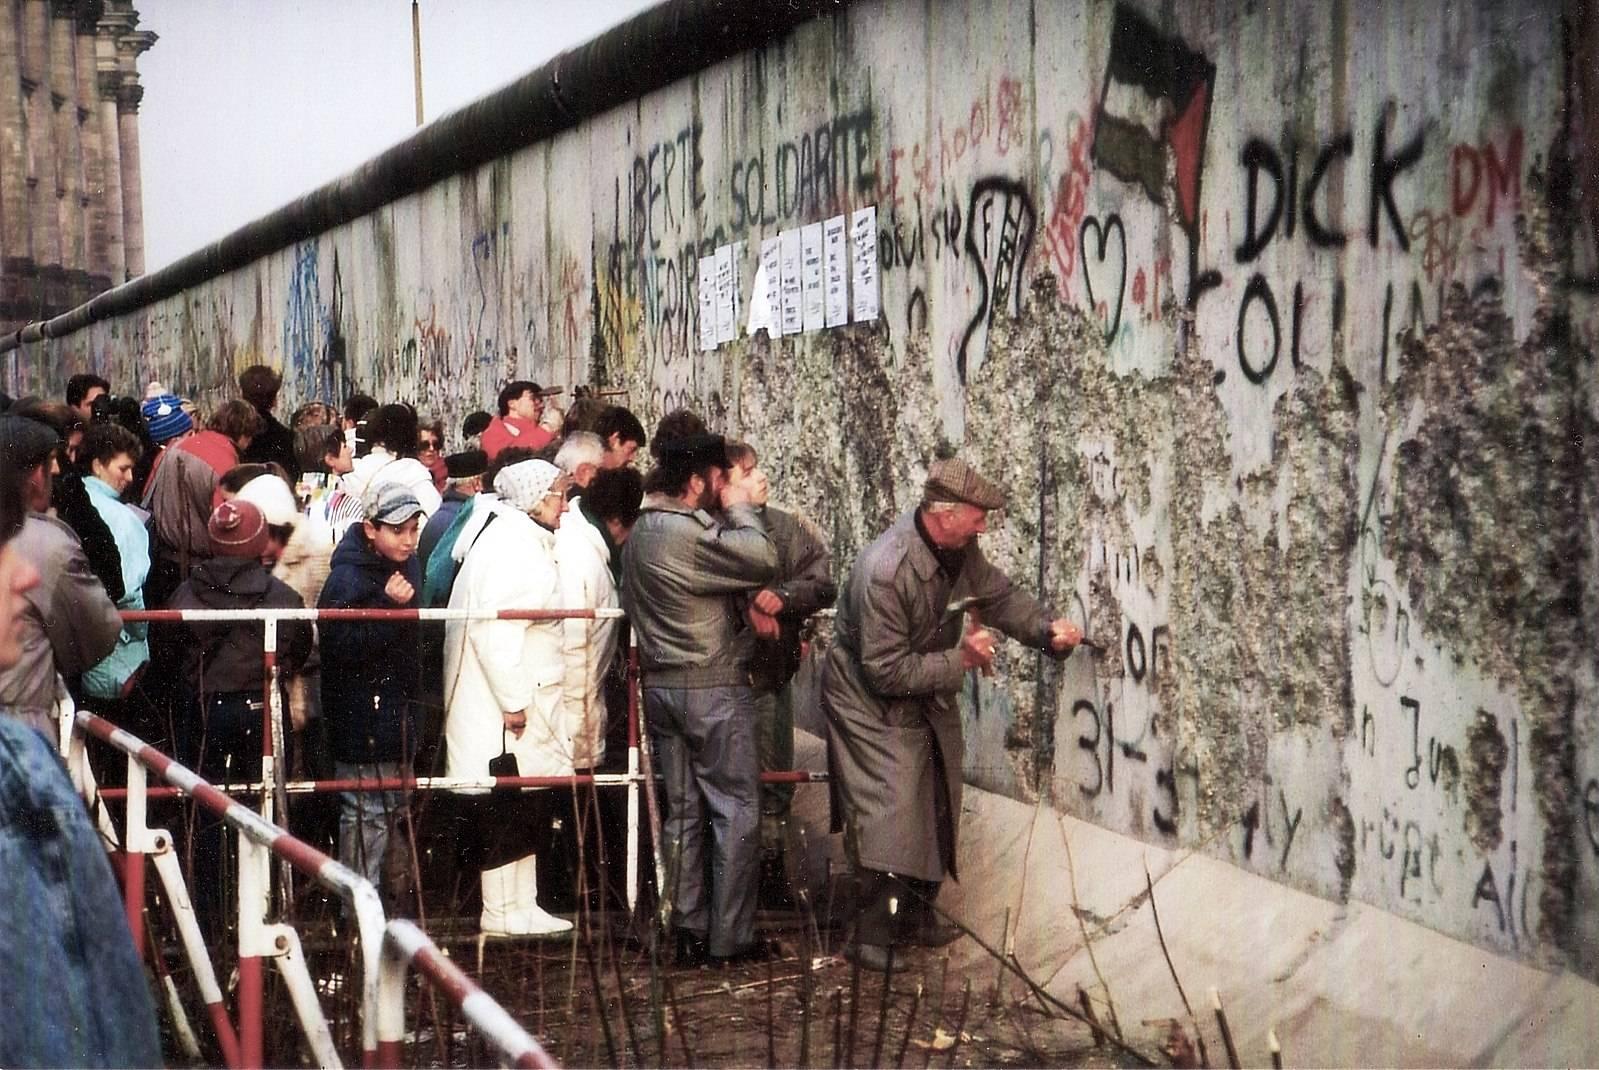 Берлинская стена - история создания и разрушения, фото, описание, карта